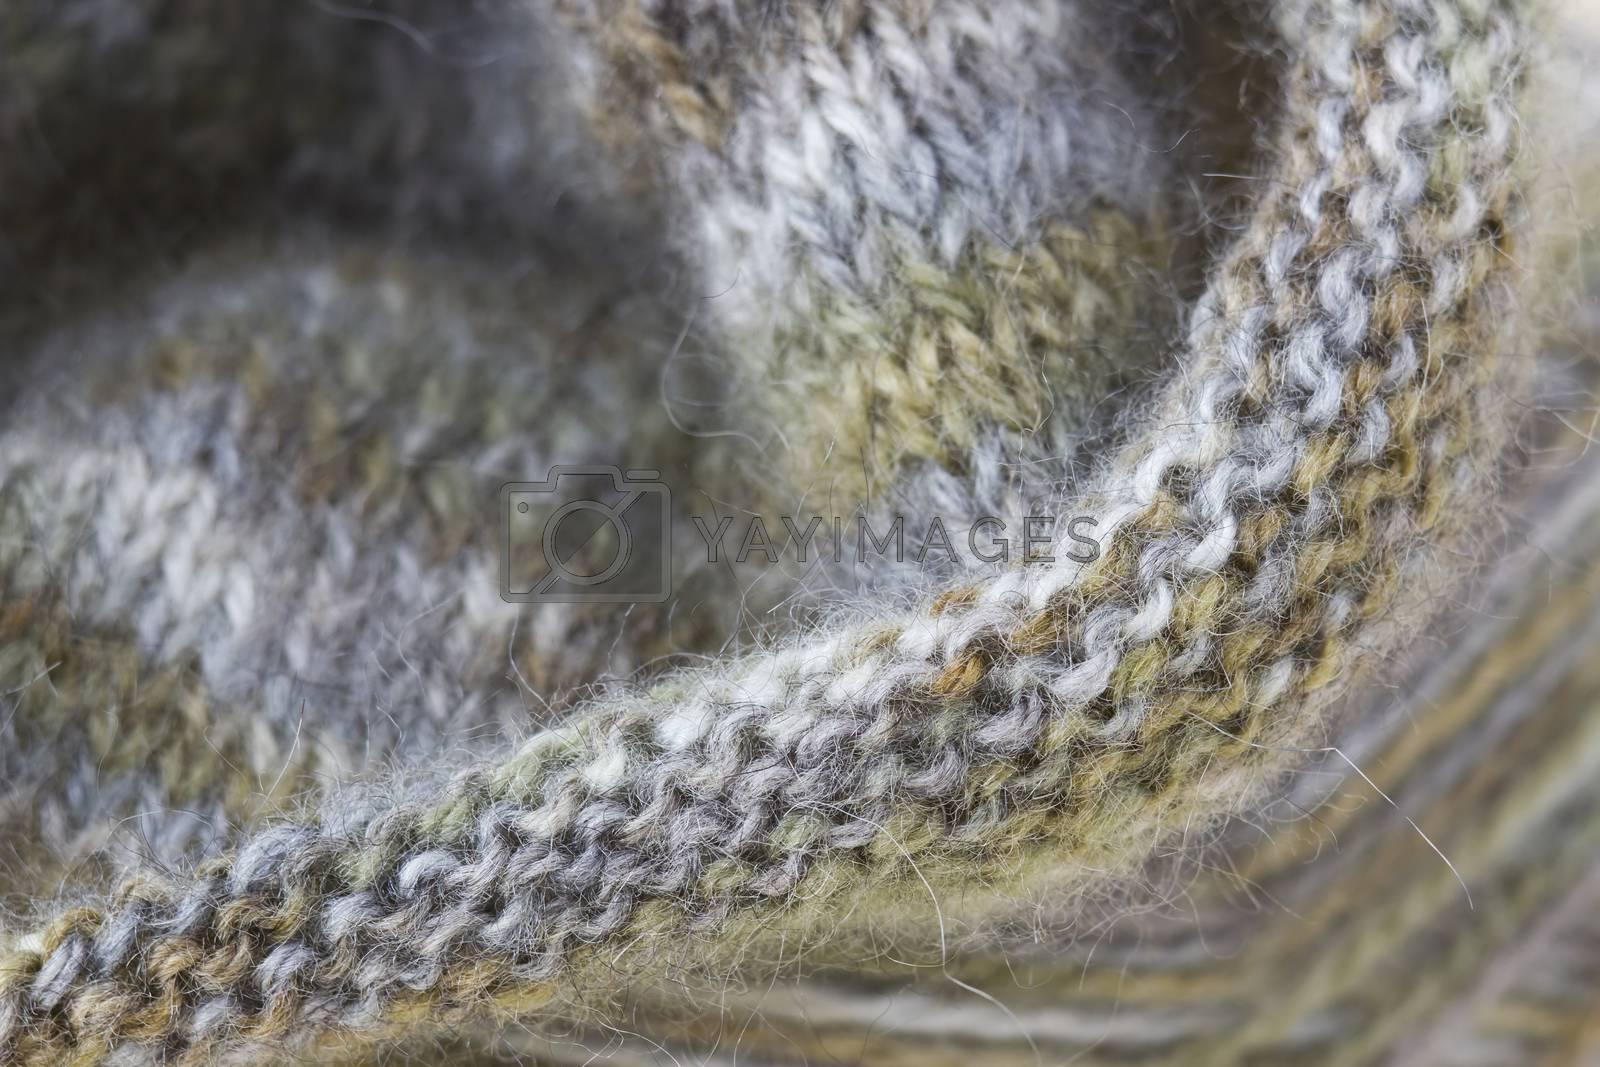 Royalty free image of Woollen thread  by miradrozdowski